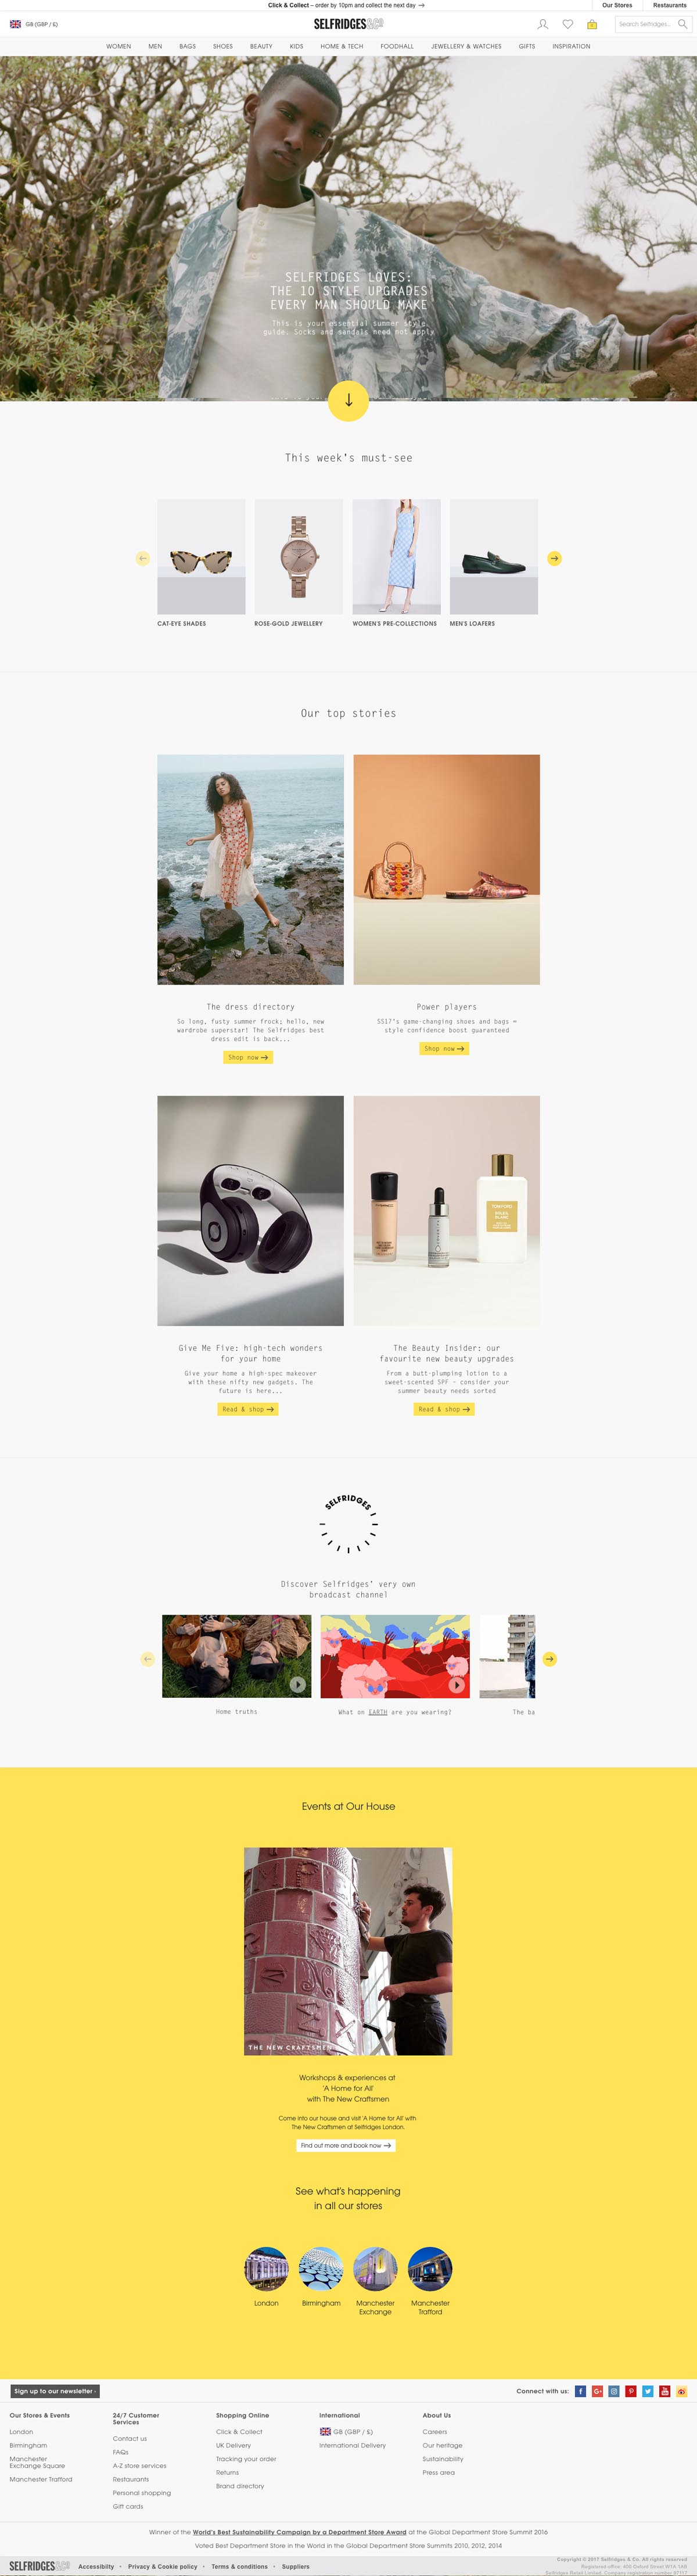 eCommerce website: Selfridges